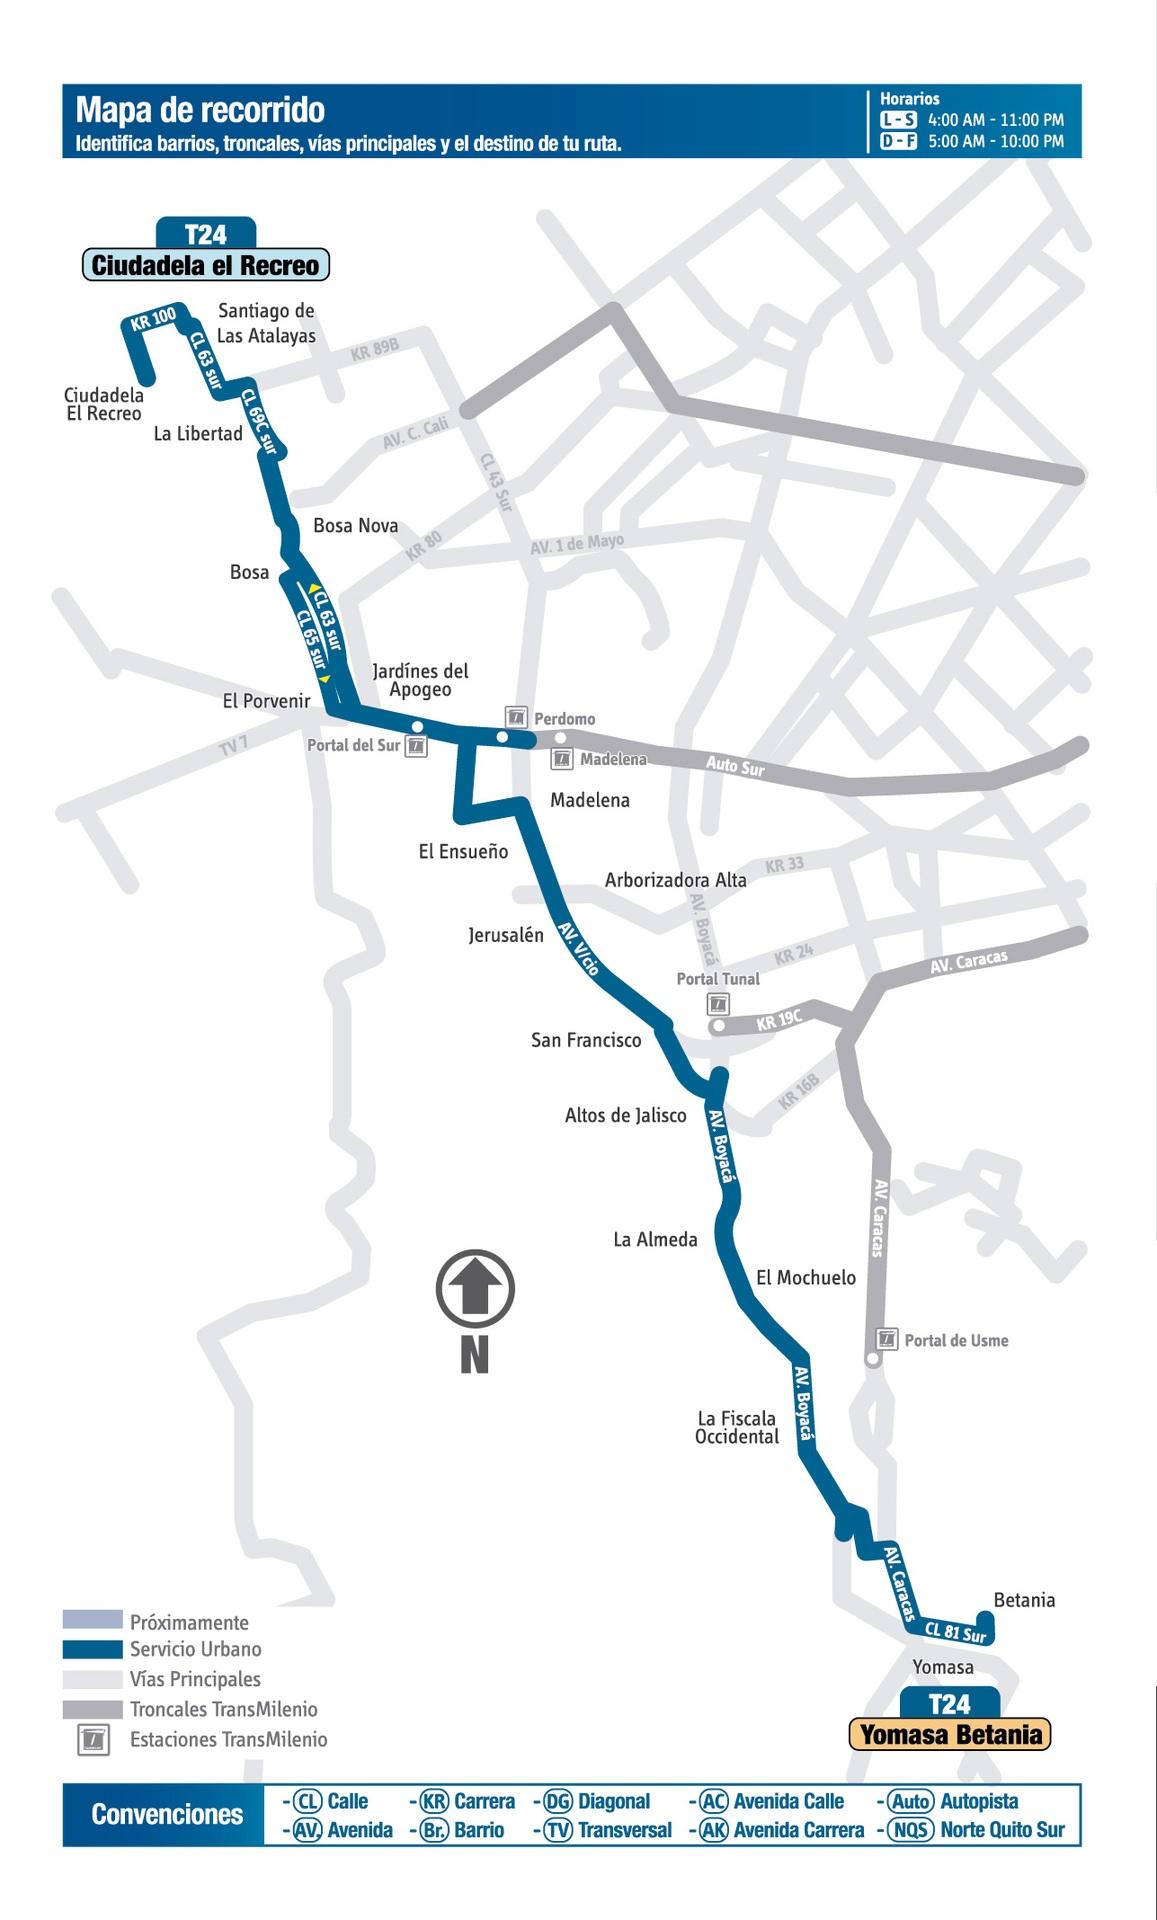 Ruta SITP: T24 - Yomasa Betania ↔ Ciudadela El Recreo [Urbana]